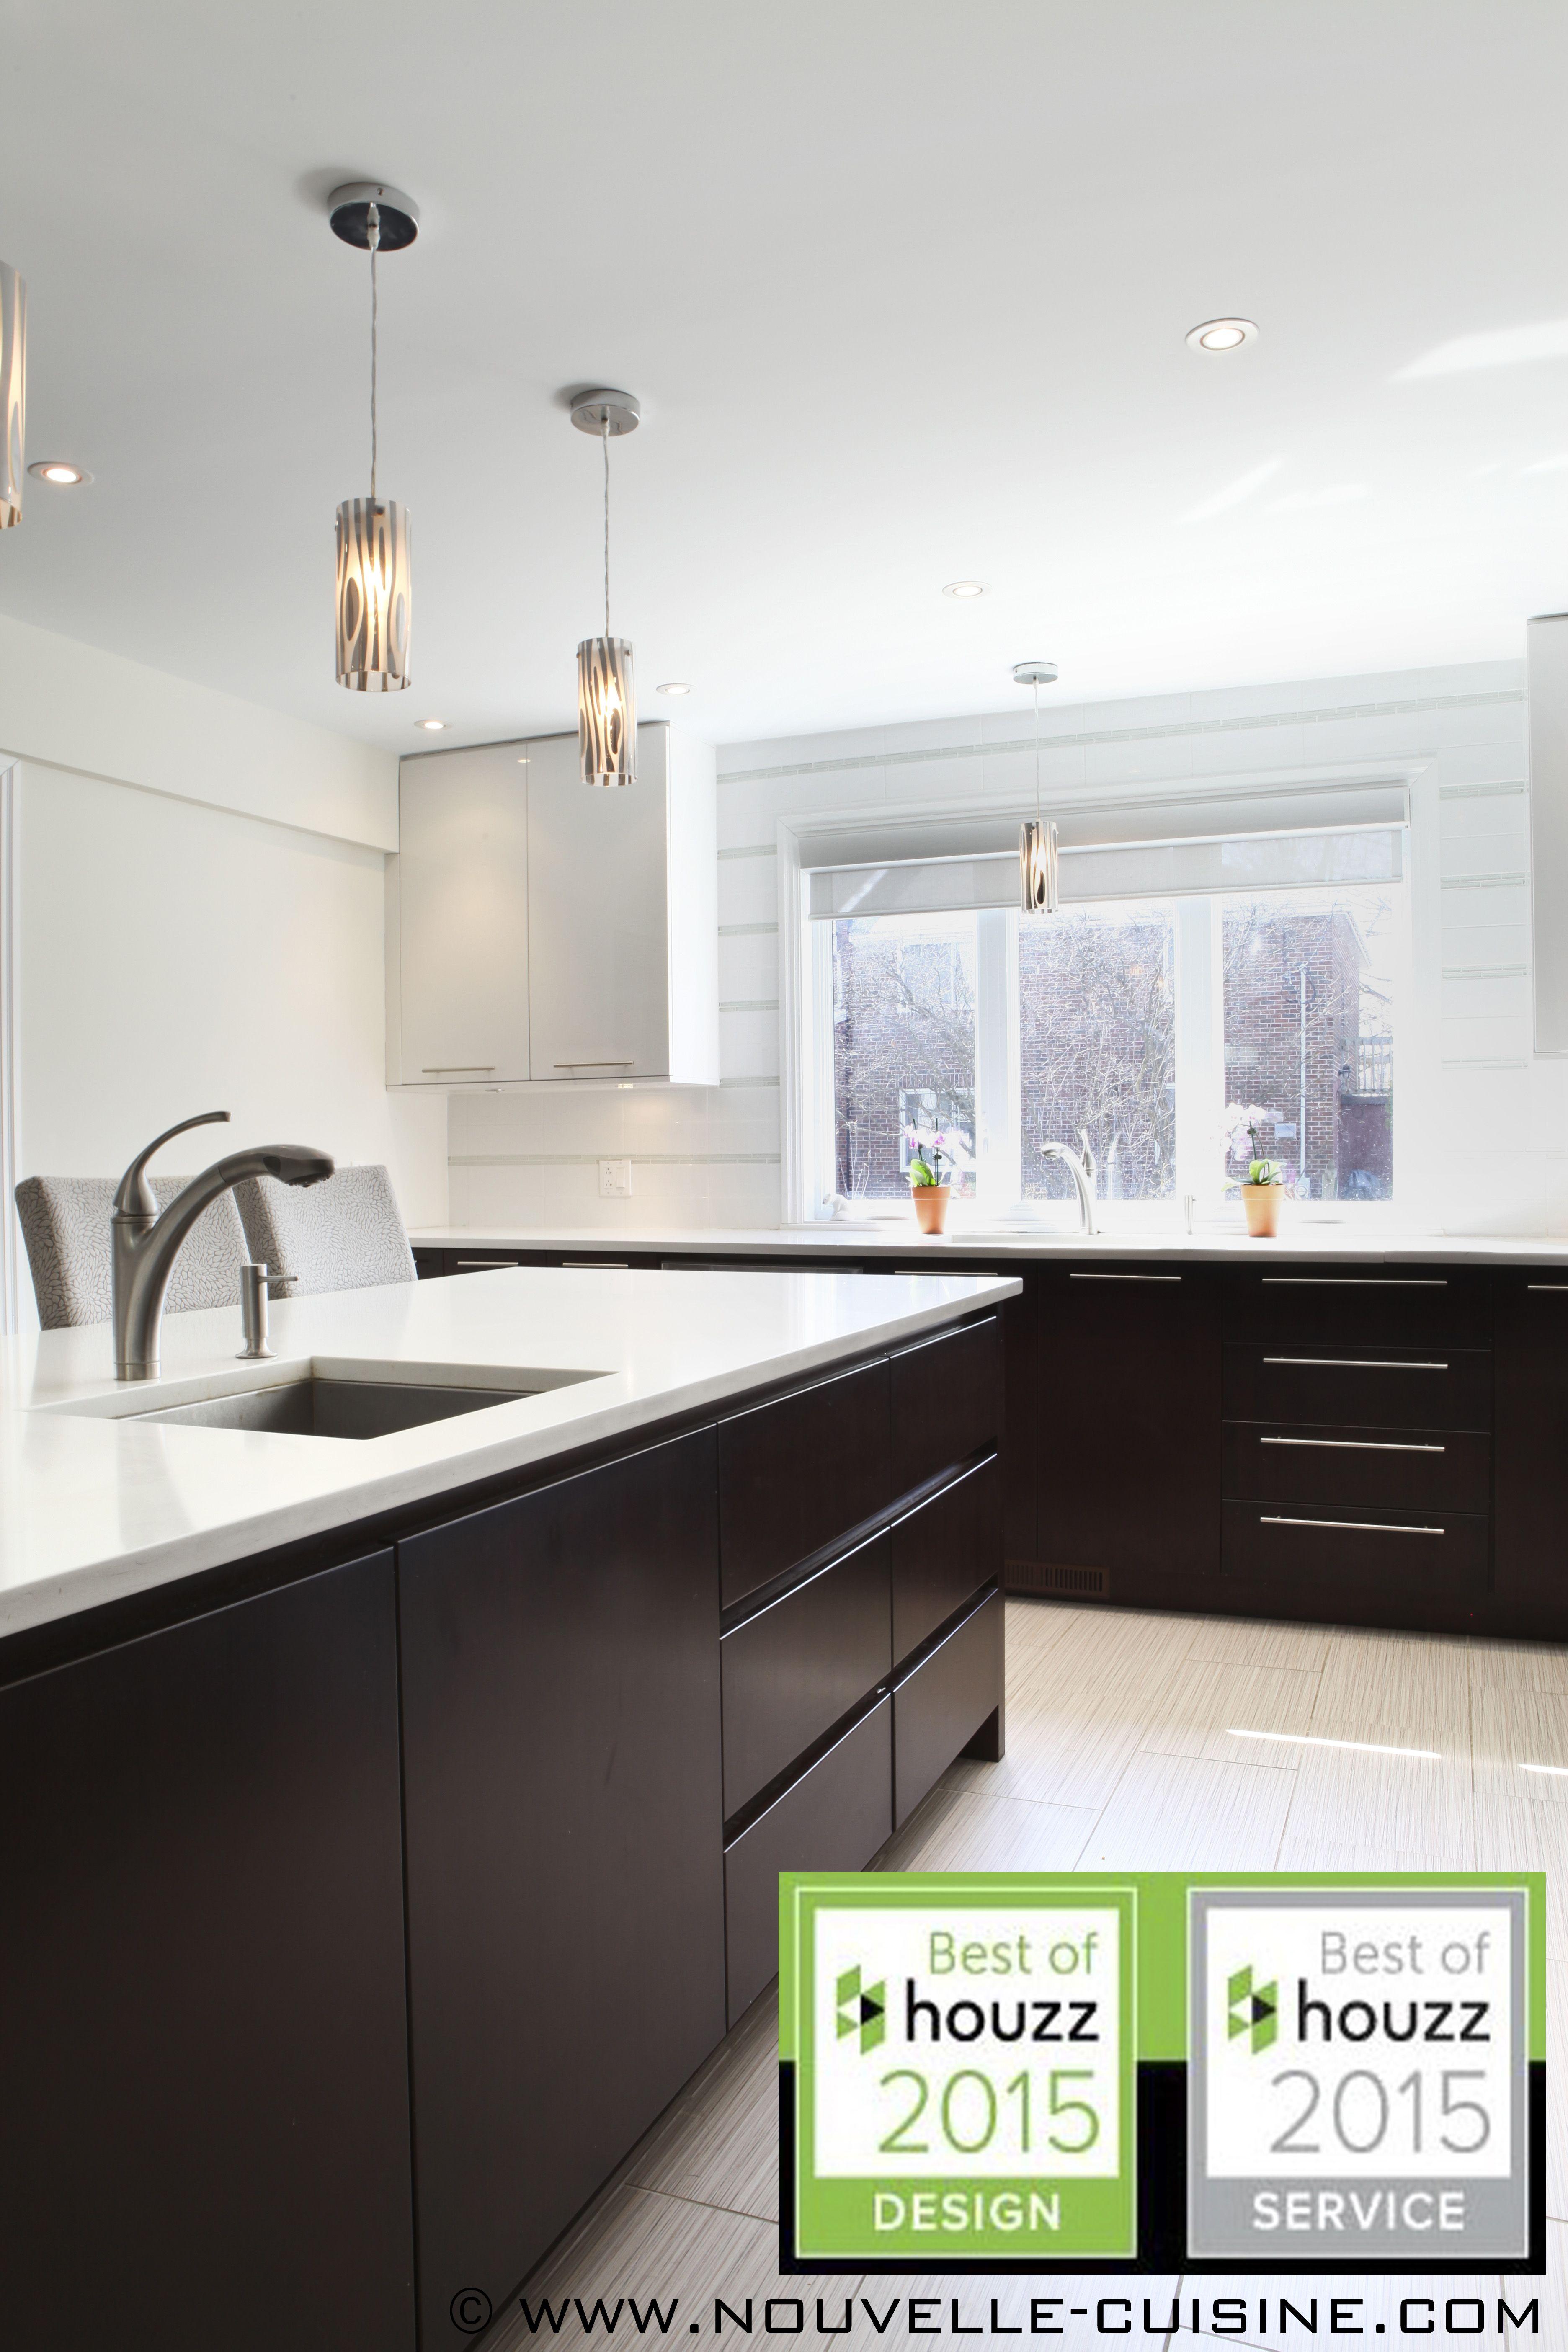 Armoire Comptoir De Famille acrylic kitchen cabinets and quartz countertops. / armoires